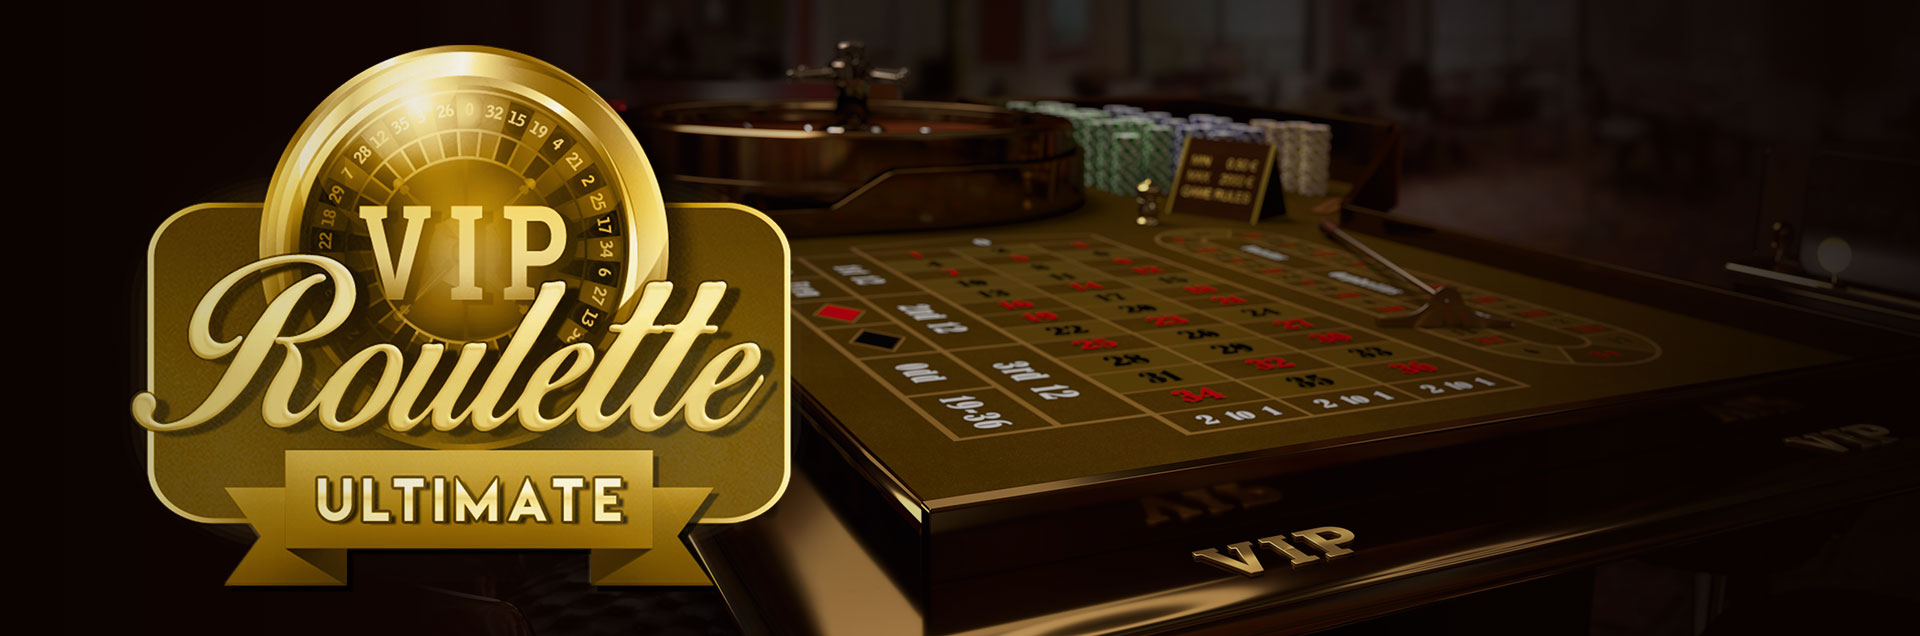 Roulette Ultimate vip logo